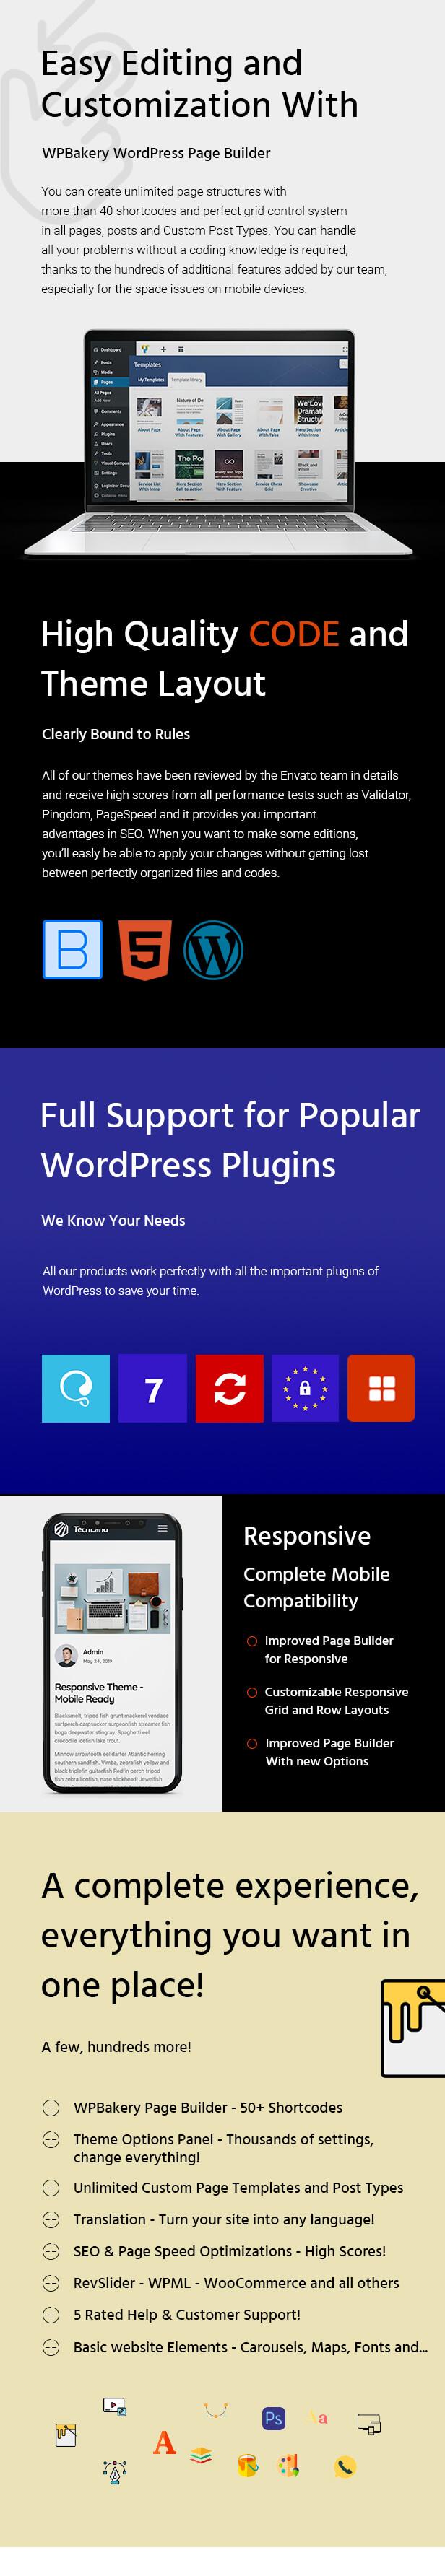 Product Launch Responsive WordPress Theme - Sawmill